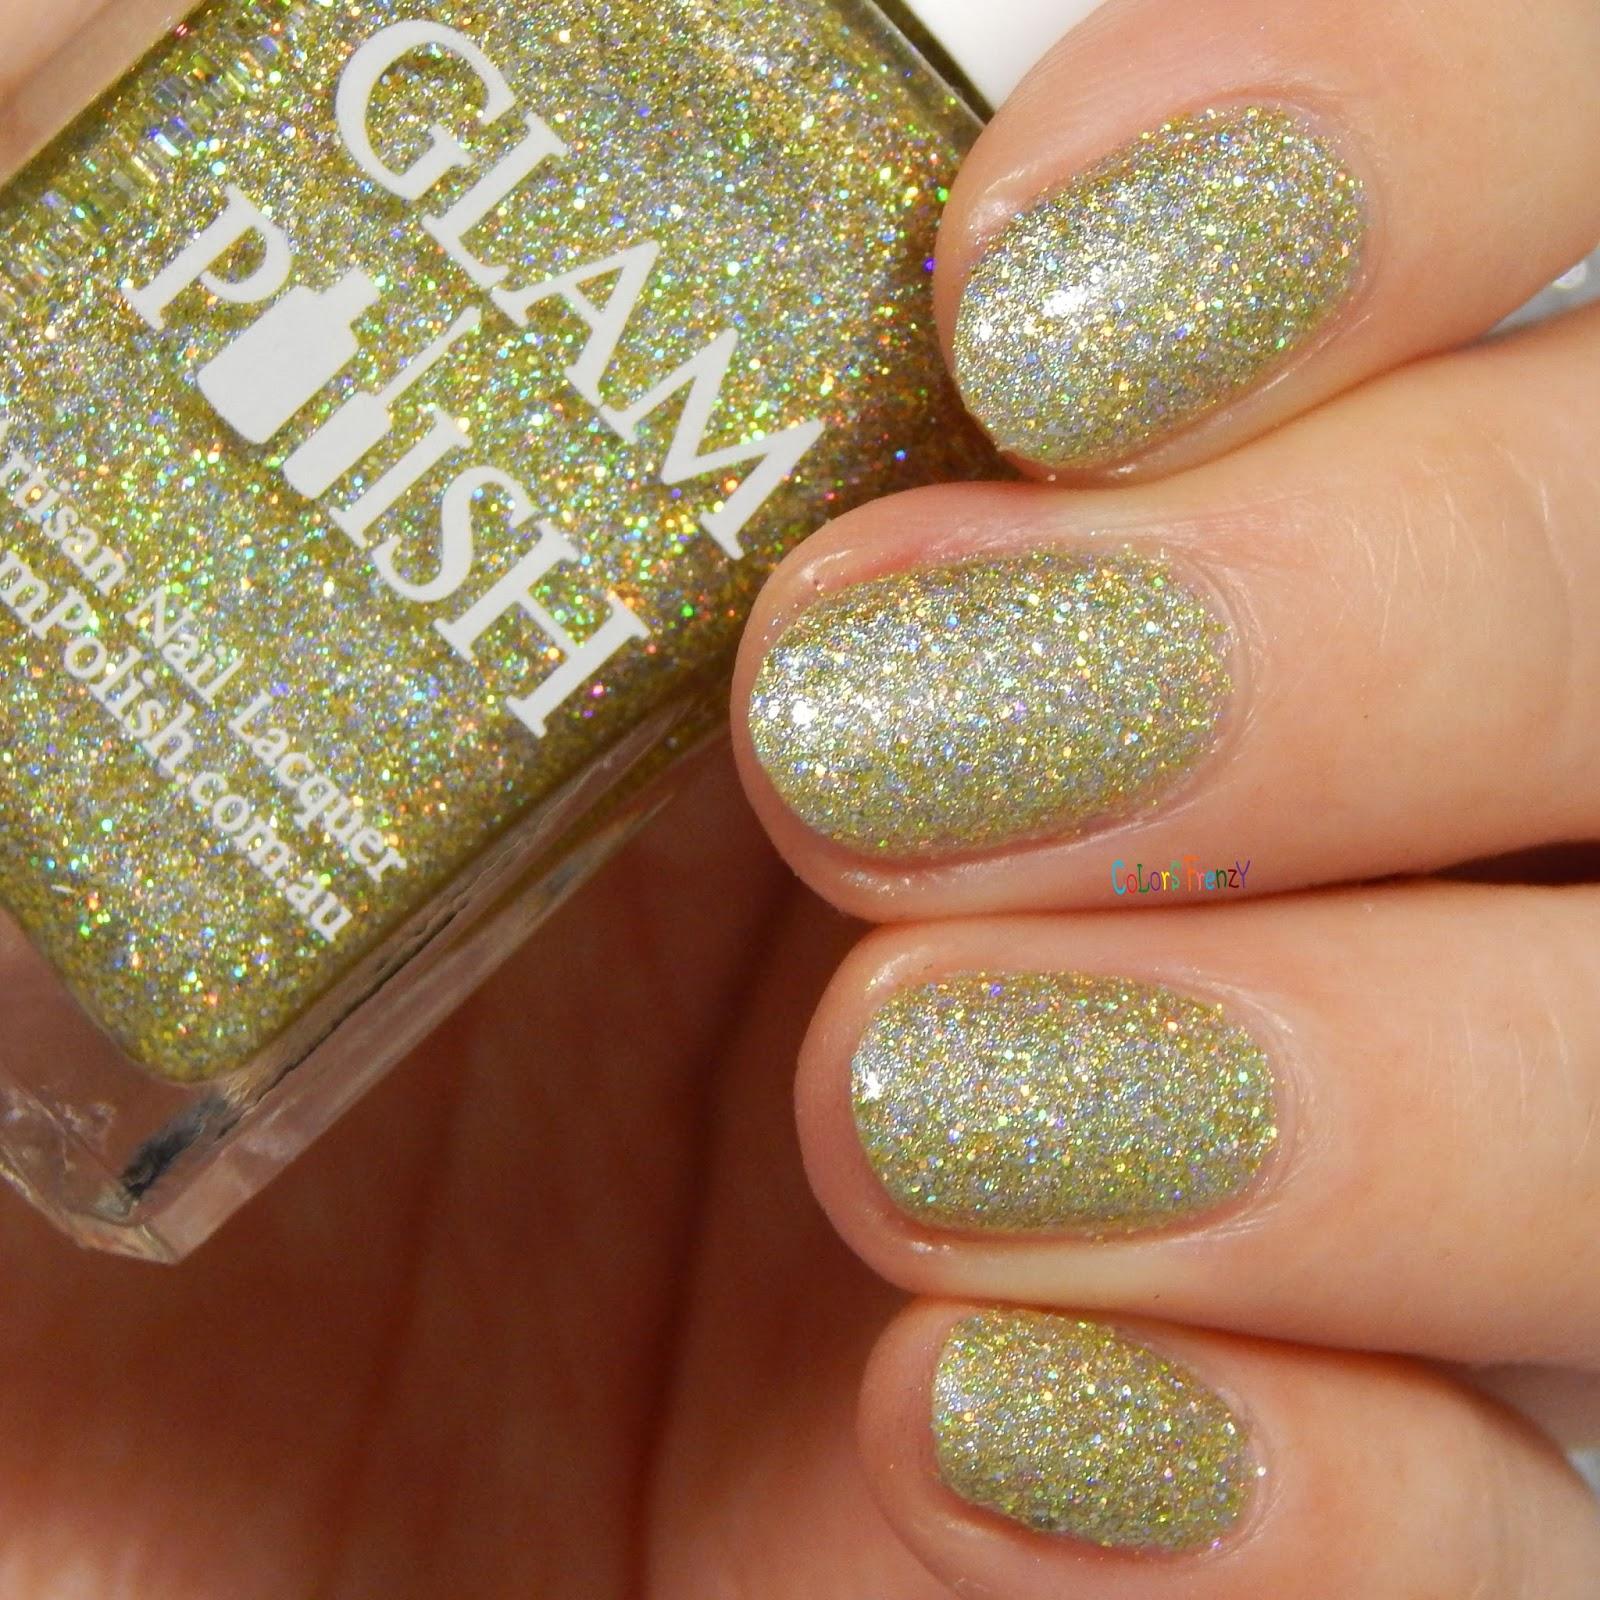 glam-polish-yeah3x